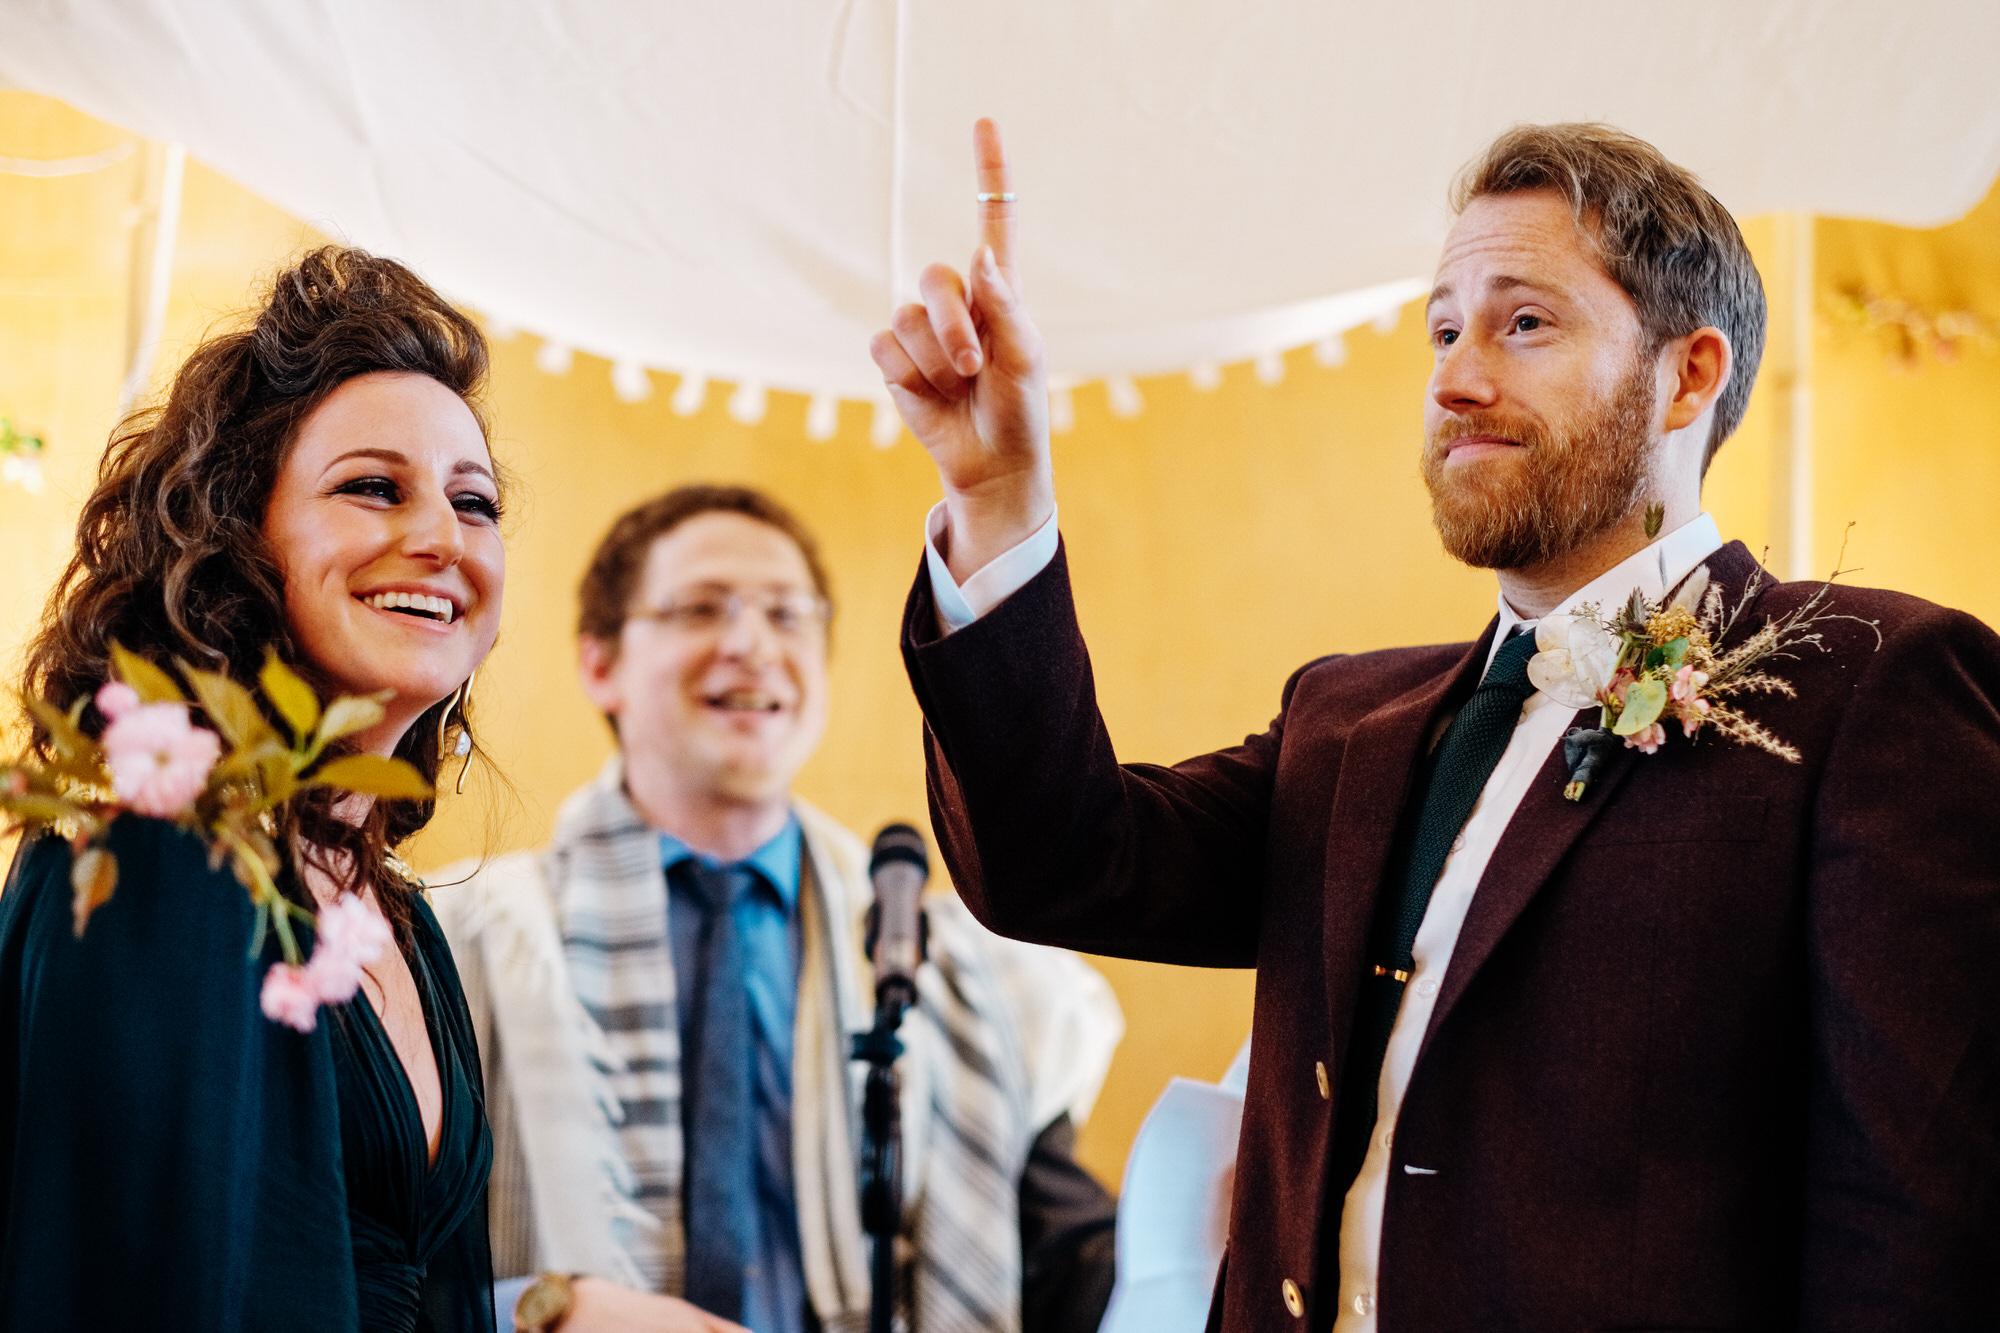 39232-jewish-wedding-photographer-london